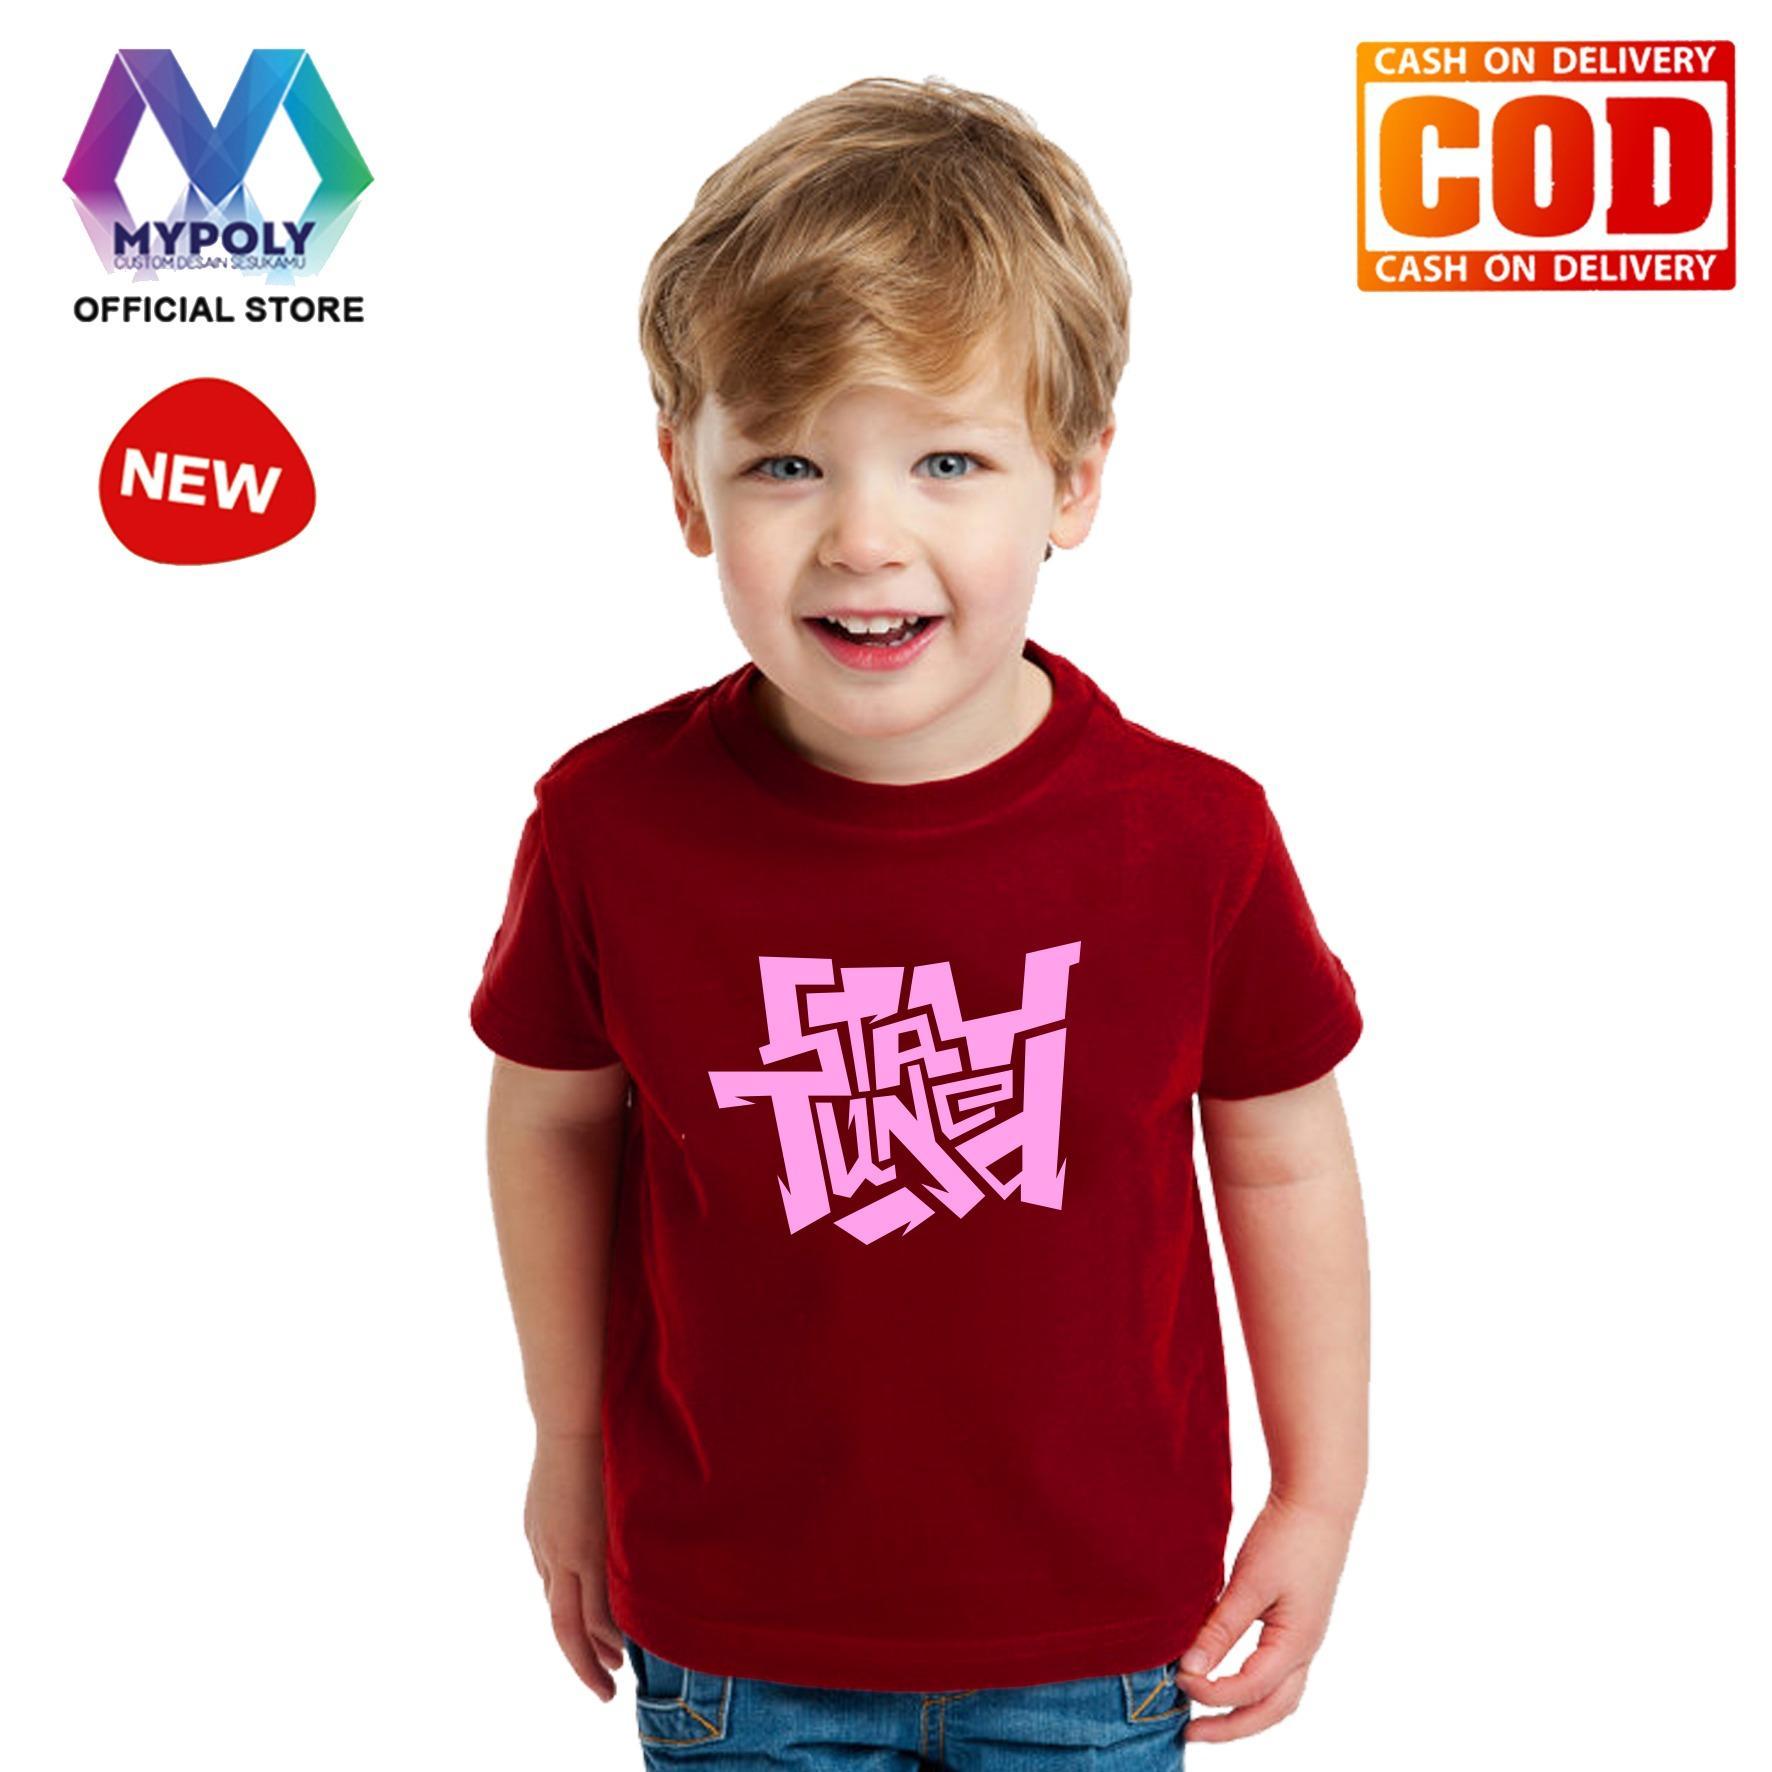 Kaos Premium Mypoly Anak Pria laki-laki AP / Baju Couple Family Keluarga / Tshirt distro / Fashion atasan / Kaos Anime / Kaos Animasi / Kaos Super Hero / Kaos Kartun / Kaos Cartoon / Kaos Lucu / Kaos Gambar Karakter / Kaos Anak Stay Tuned